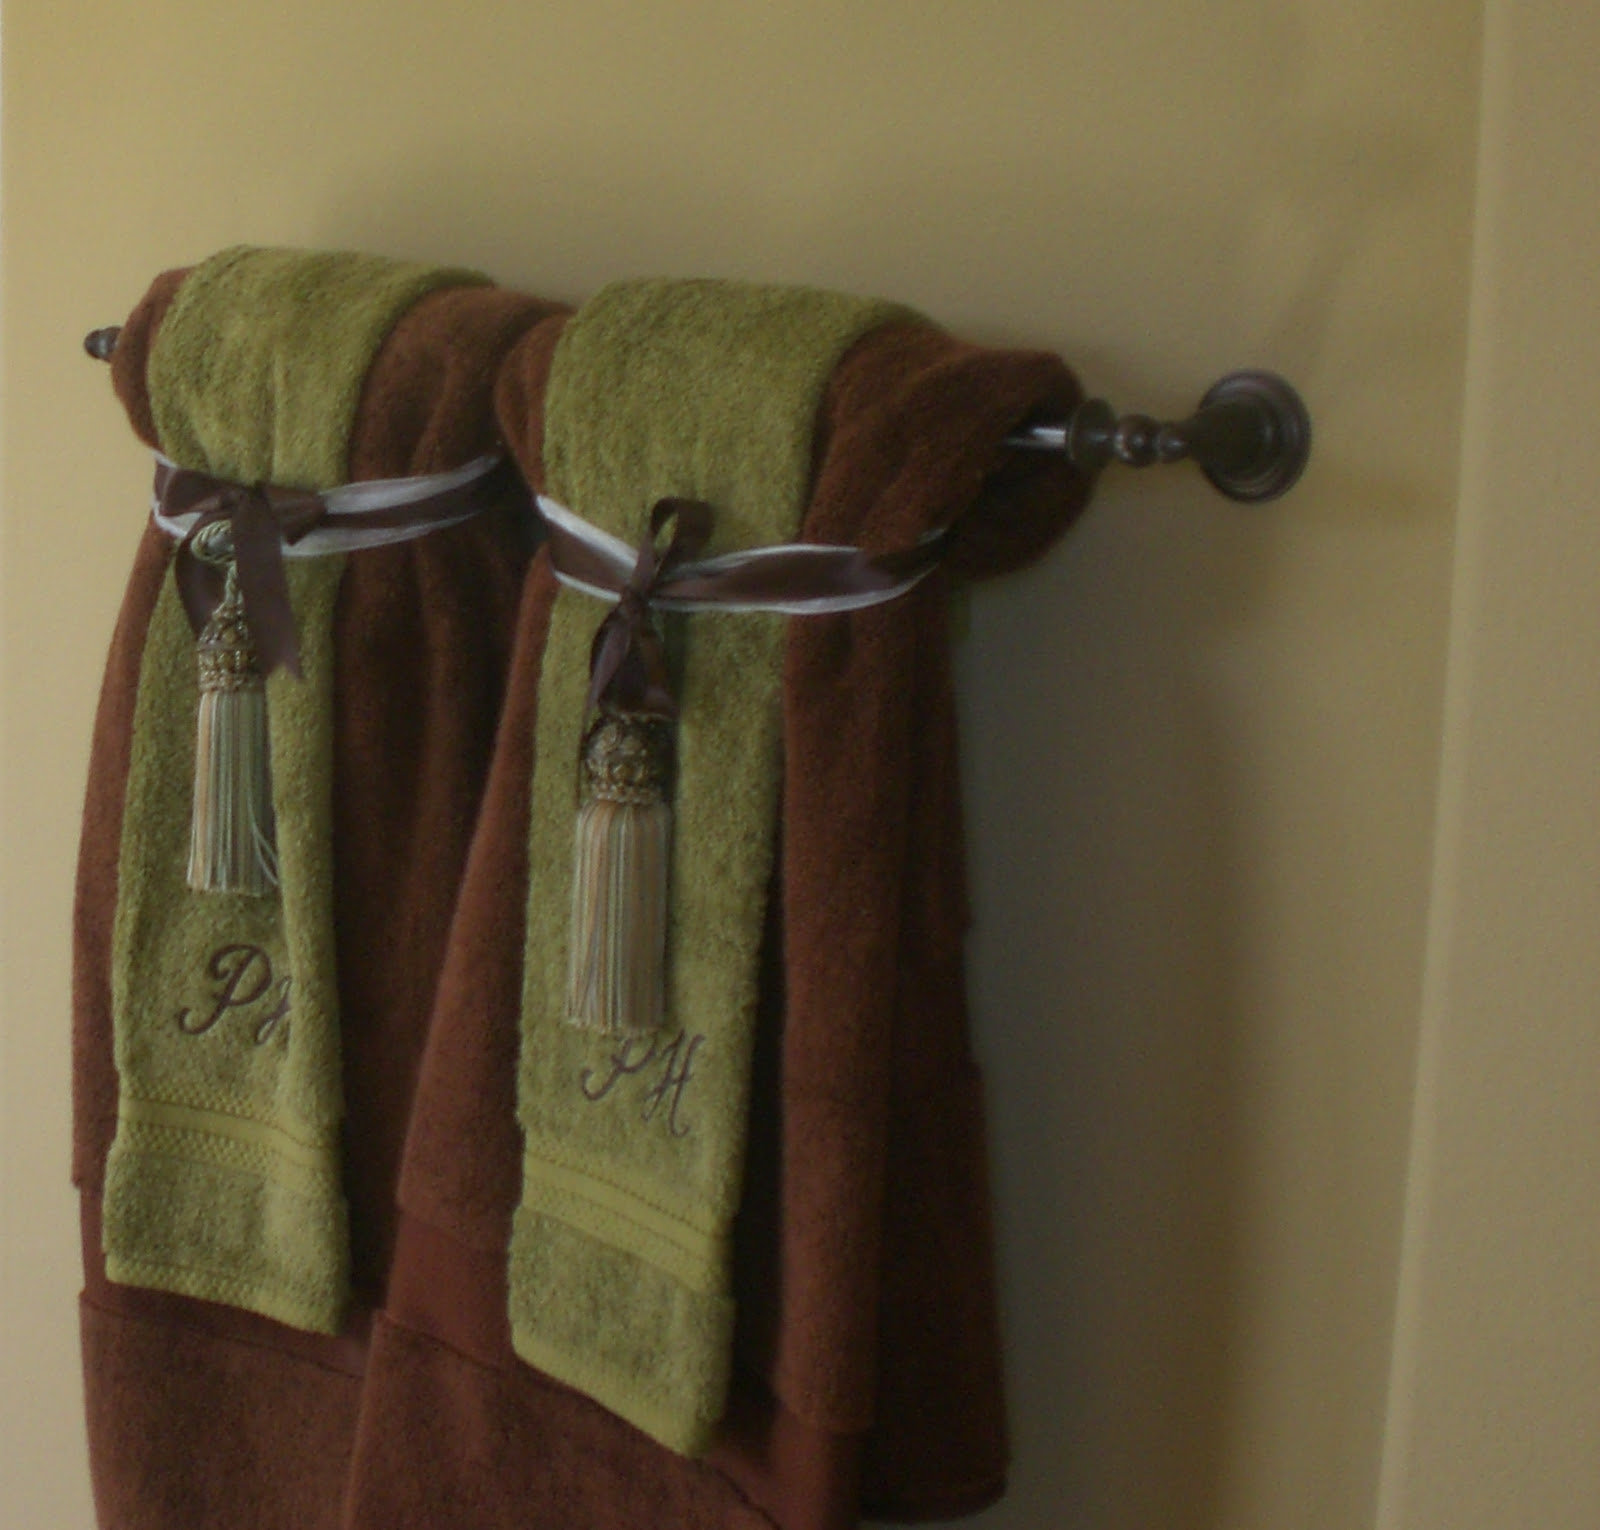 Bathroom Towel Rack Decorating Ideas How To сhoose A Perfect Towel